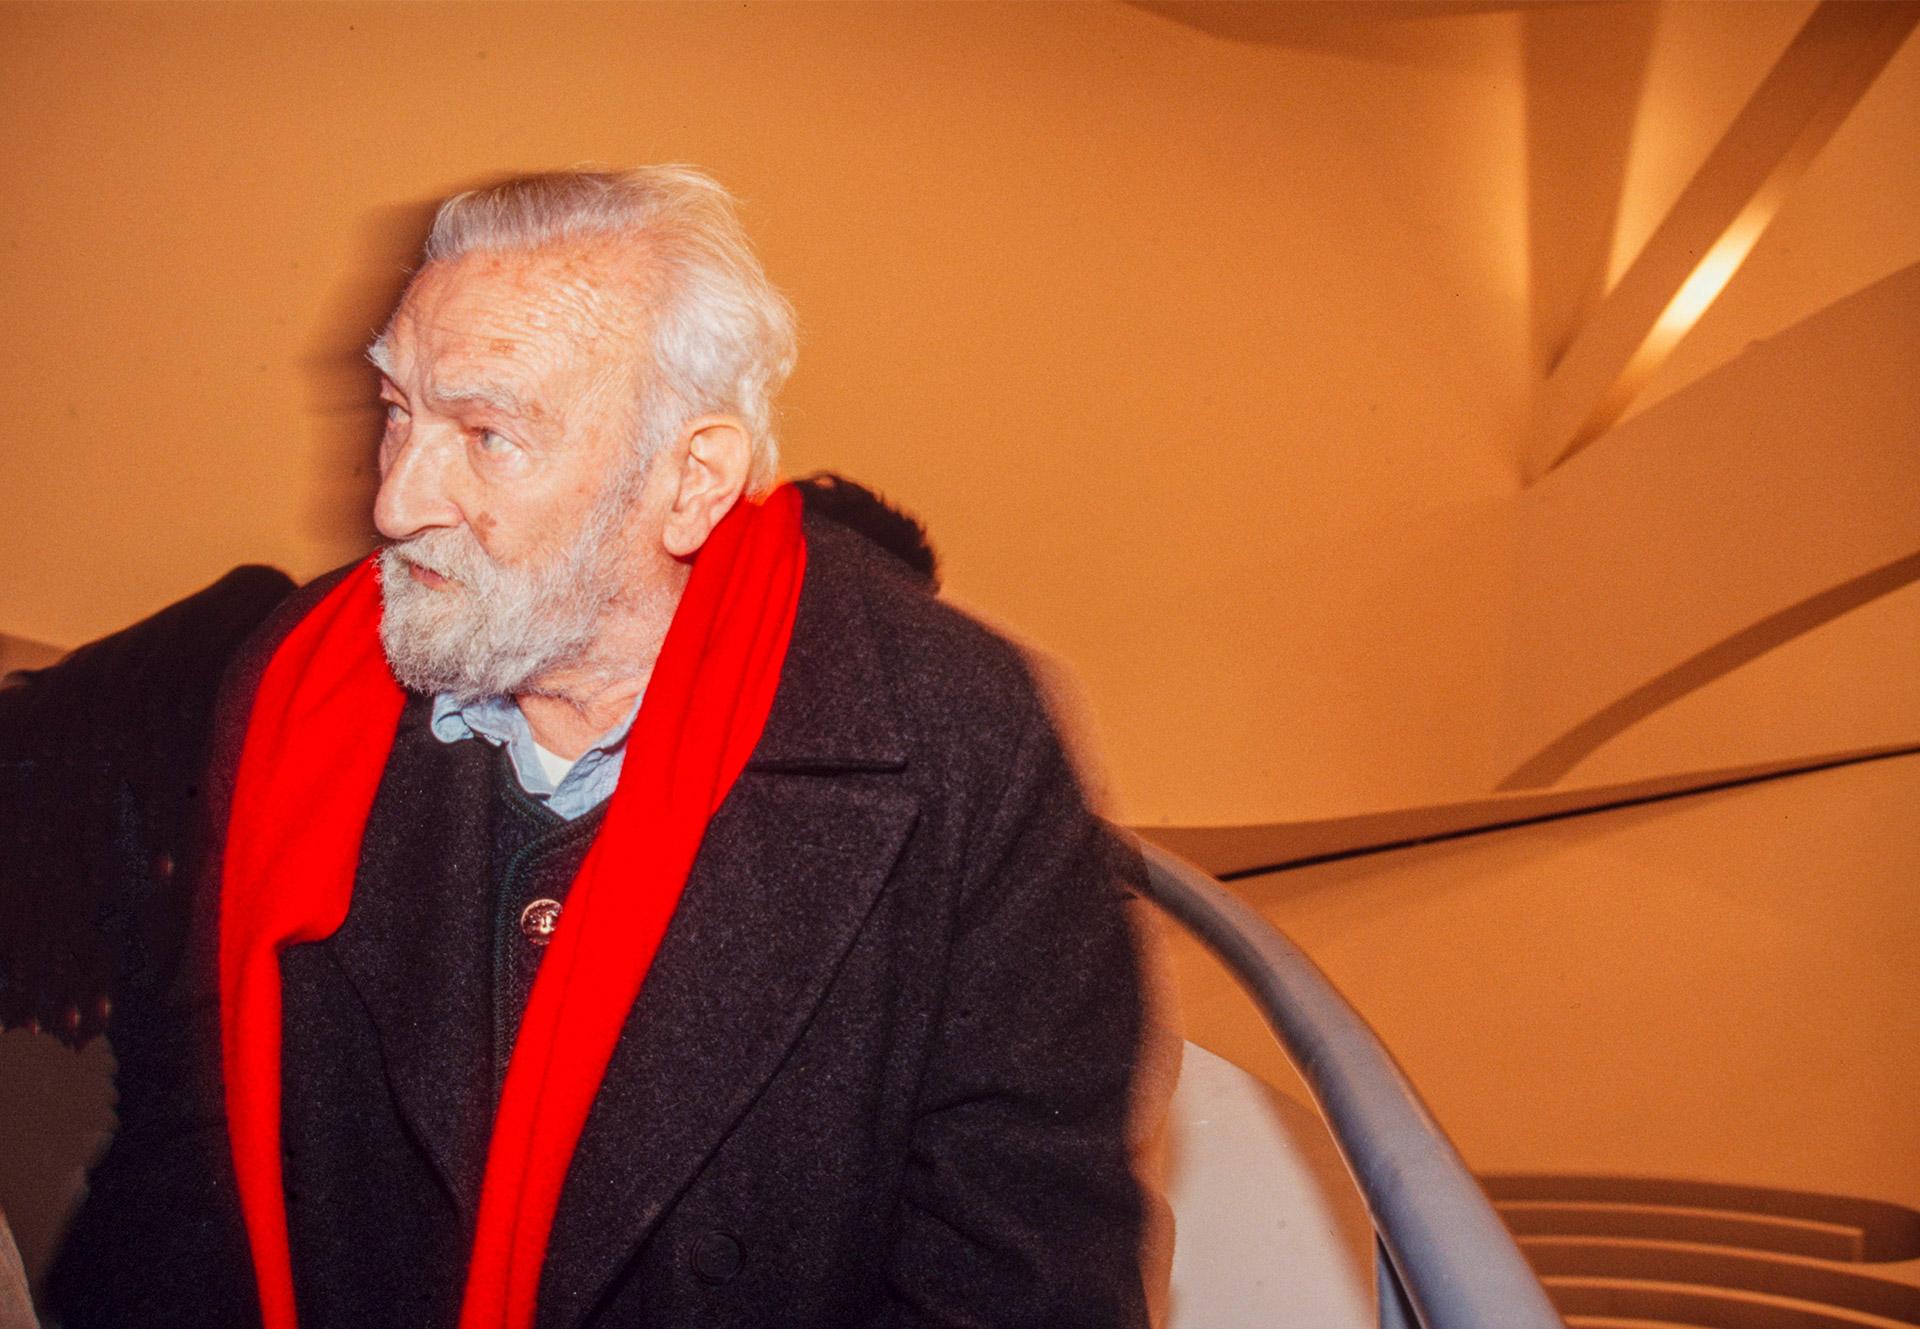 Jorge Oteiza | Artistas | Guggenheim Bilbao Museoa